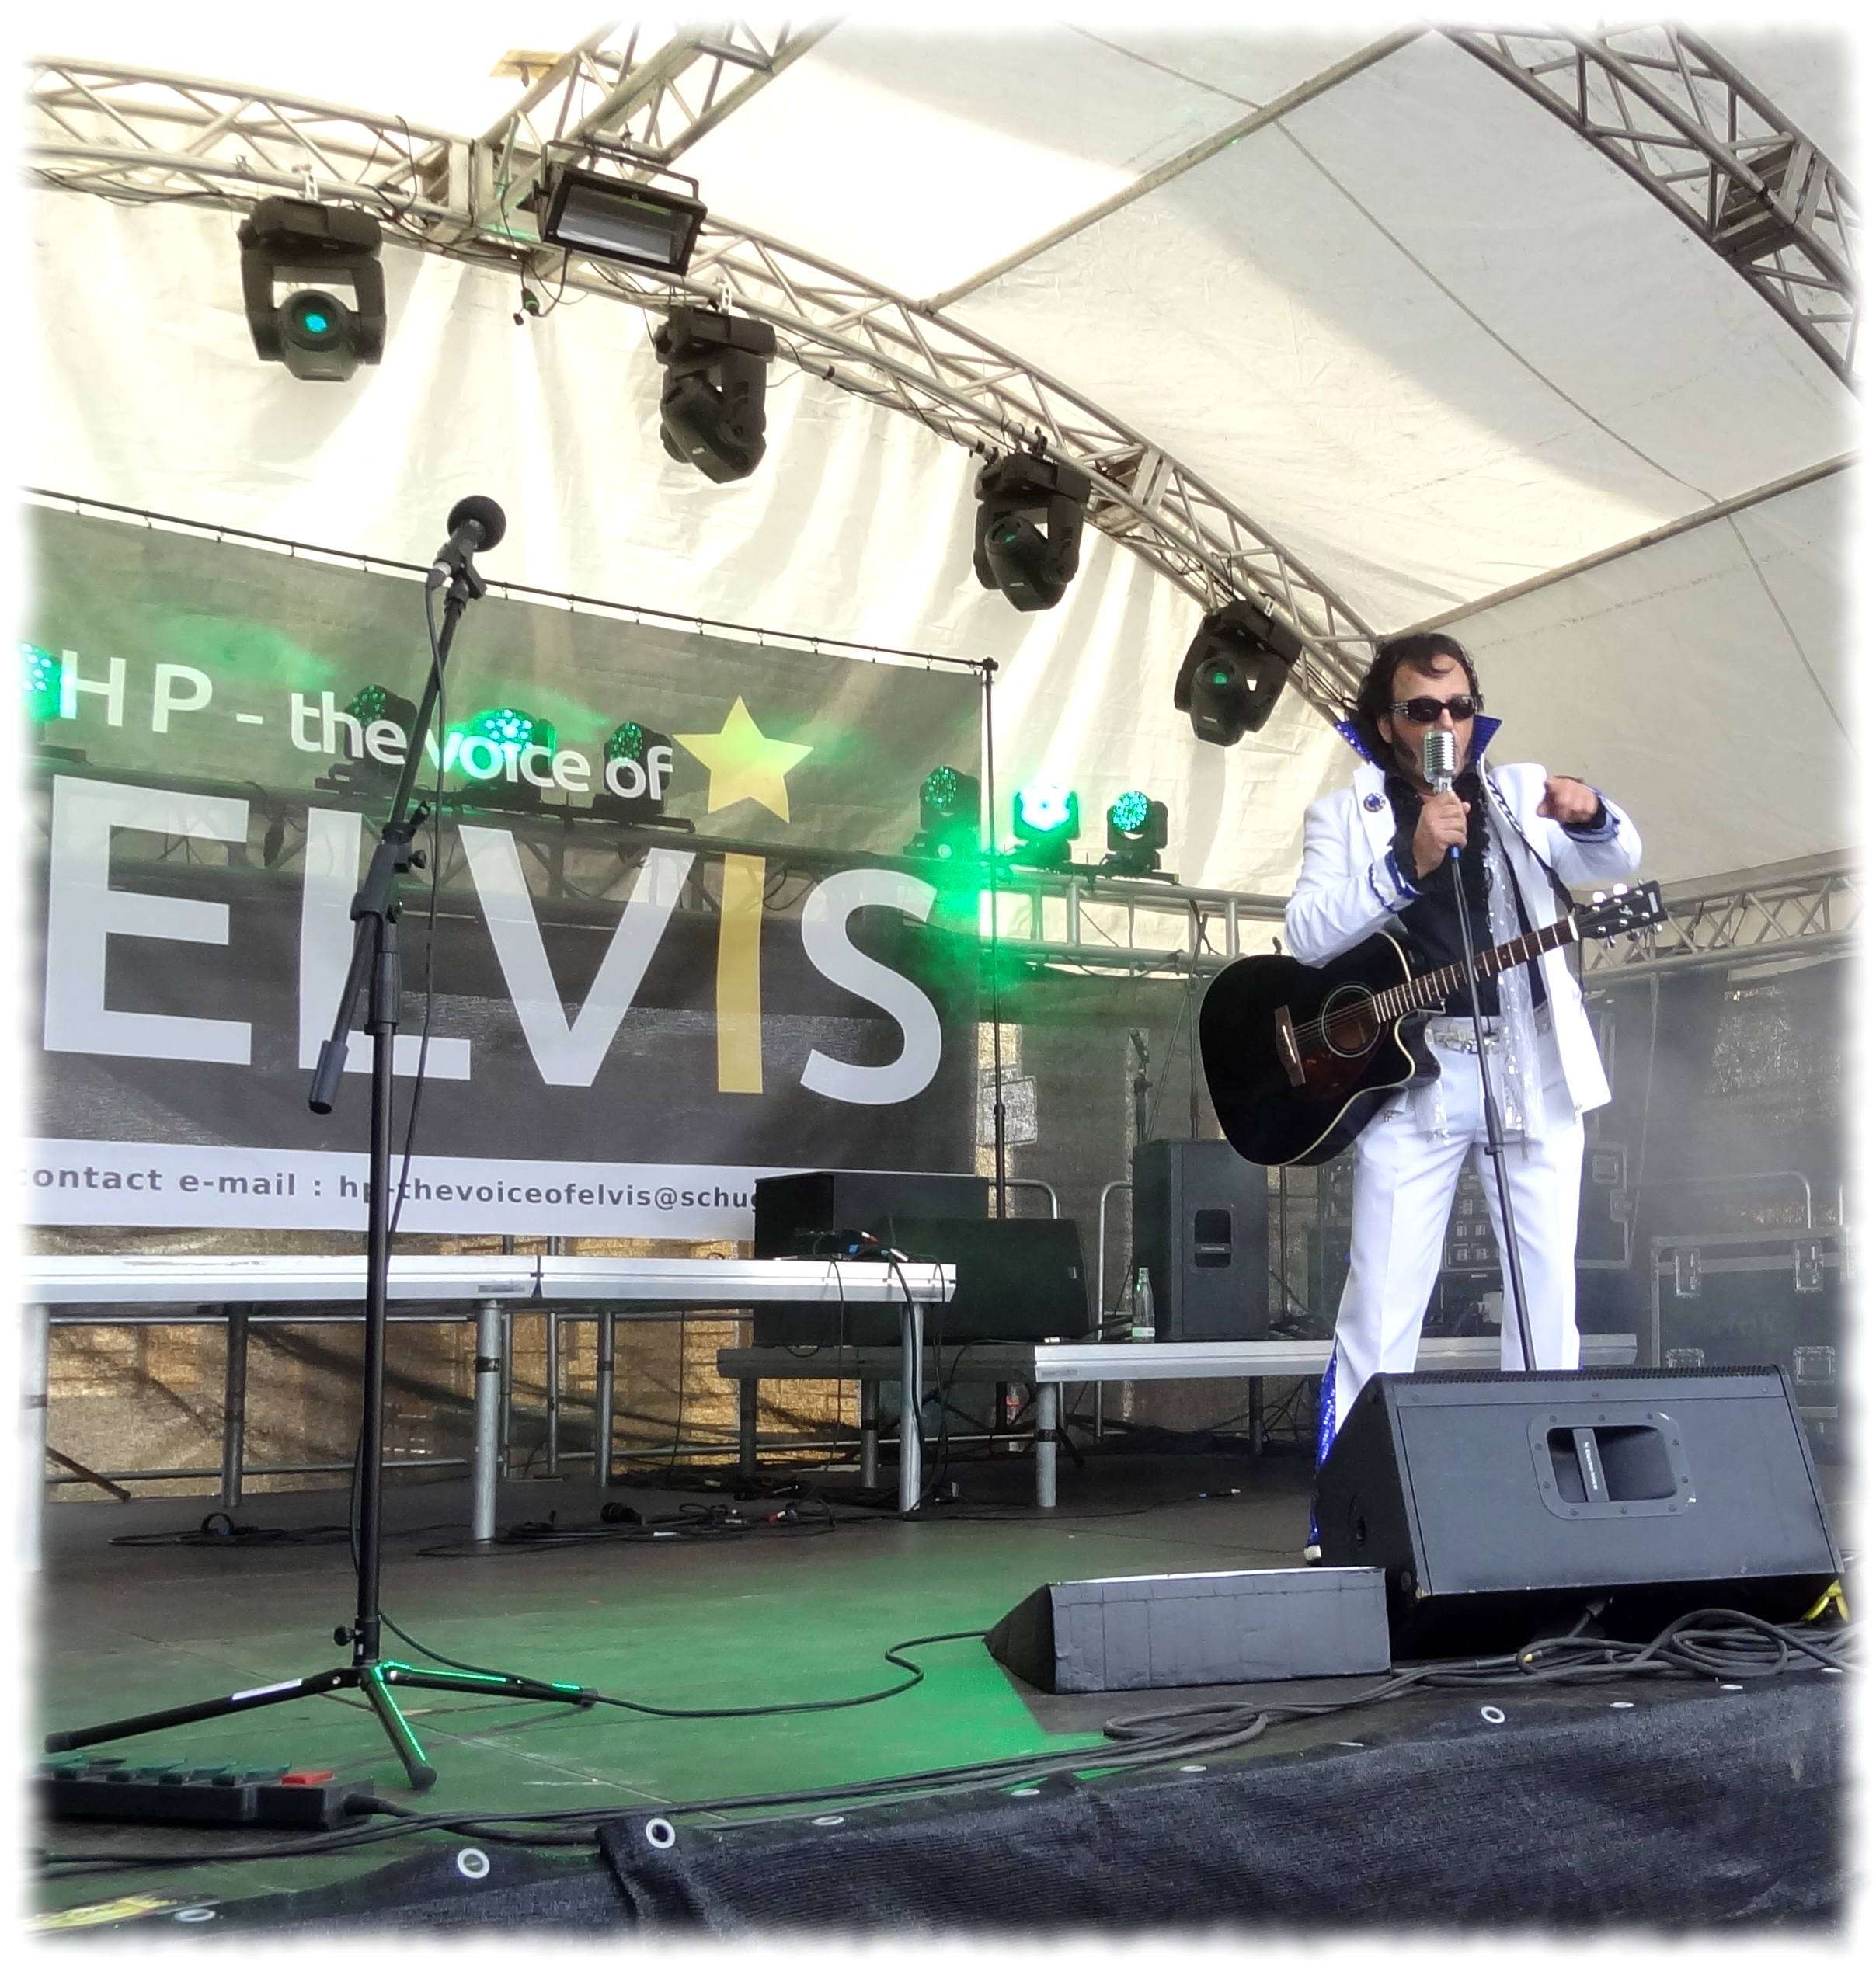 hp-elvis-deichstadtfest-1